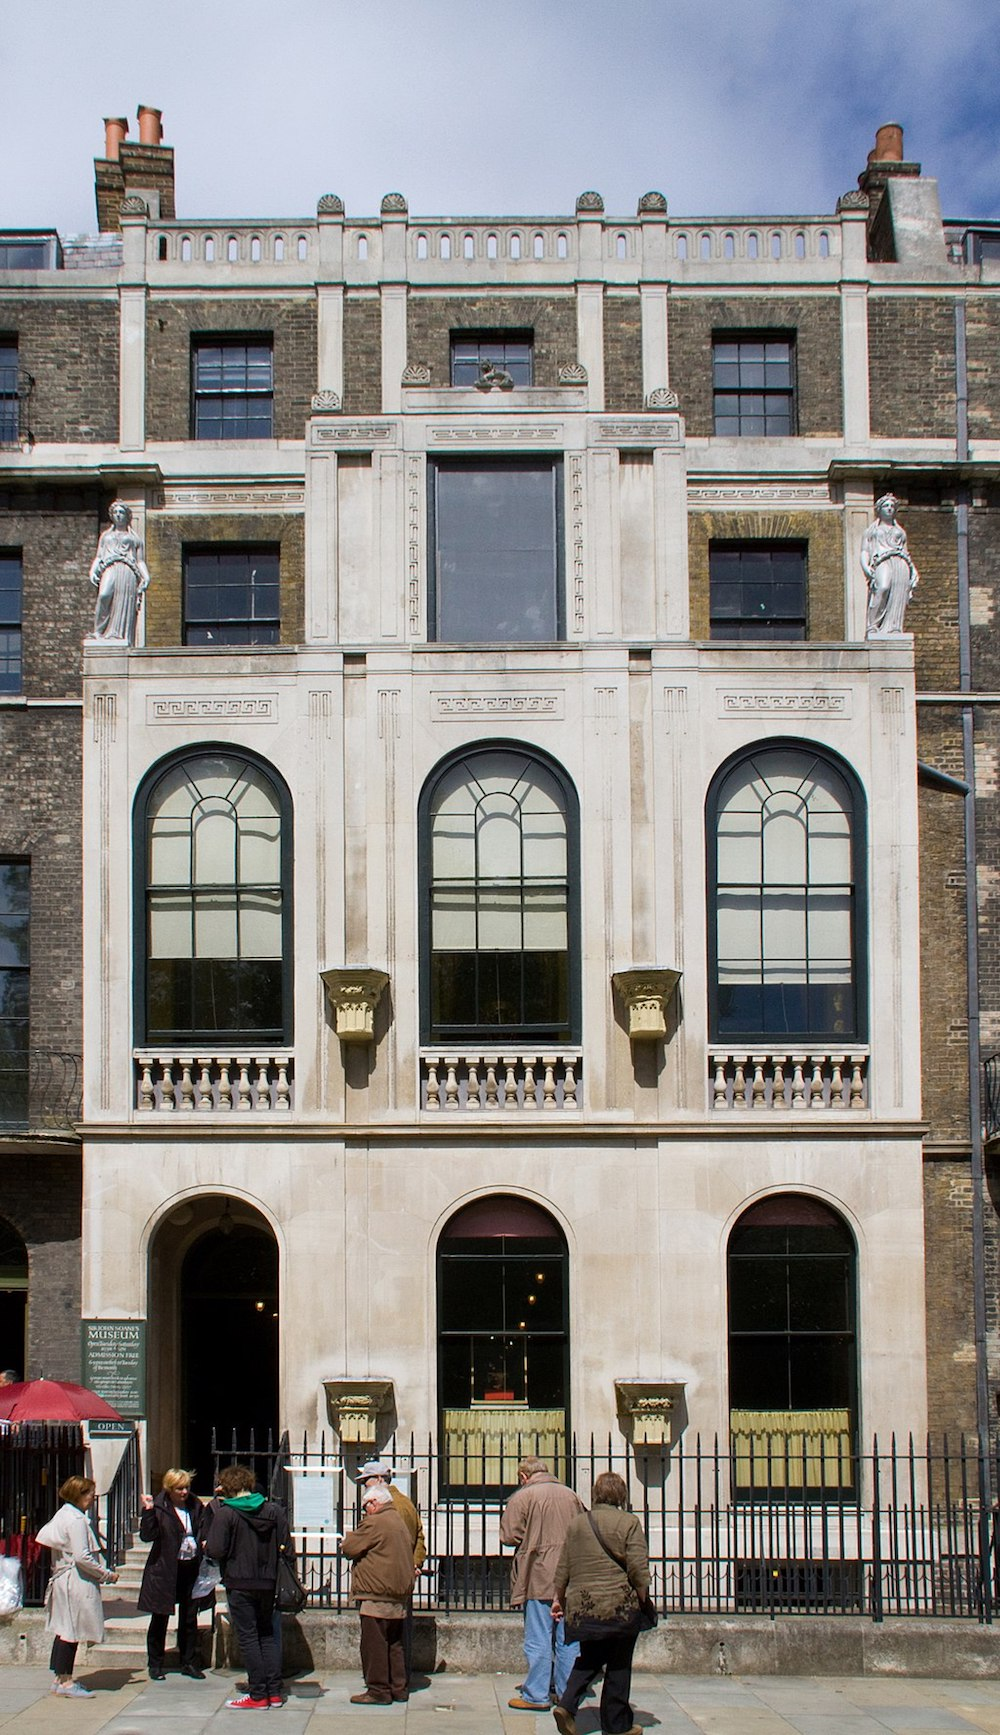 Sir John Soane Museum in London. Photo Credit: © Tony Hisgett via Wikimedia Commons.